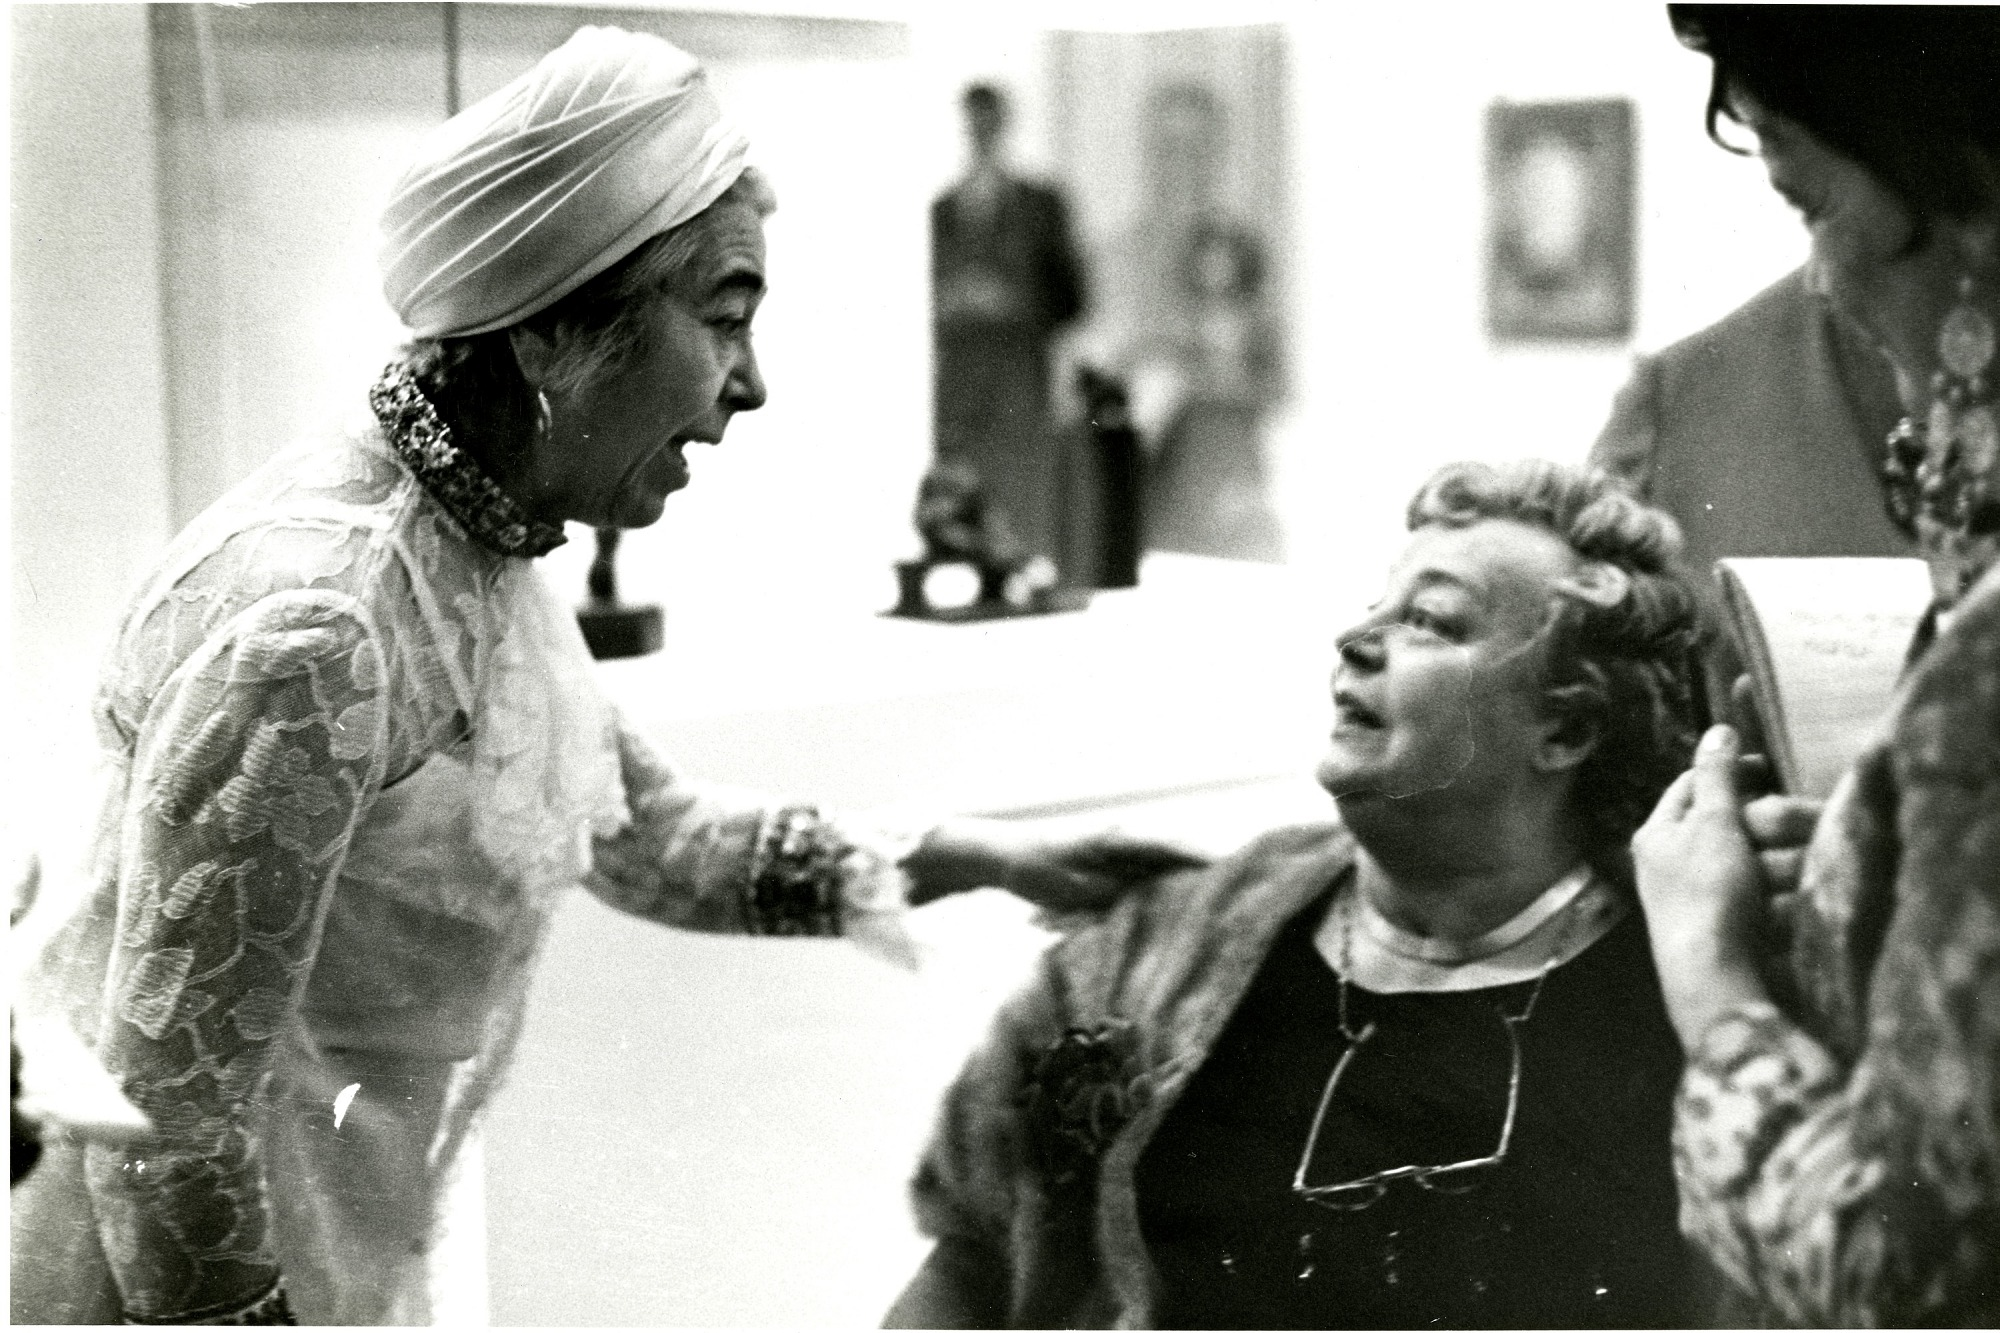 Edith Halpert and Mrs. Charles Sheeler at Opening of Sheeler Exhibit